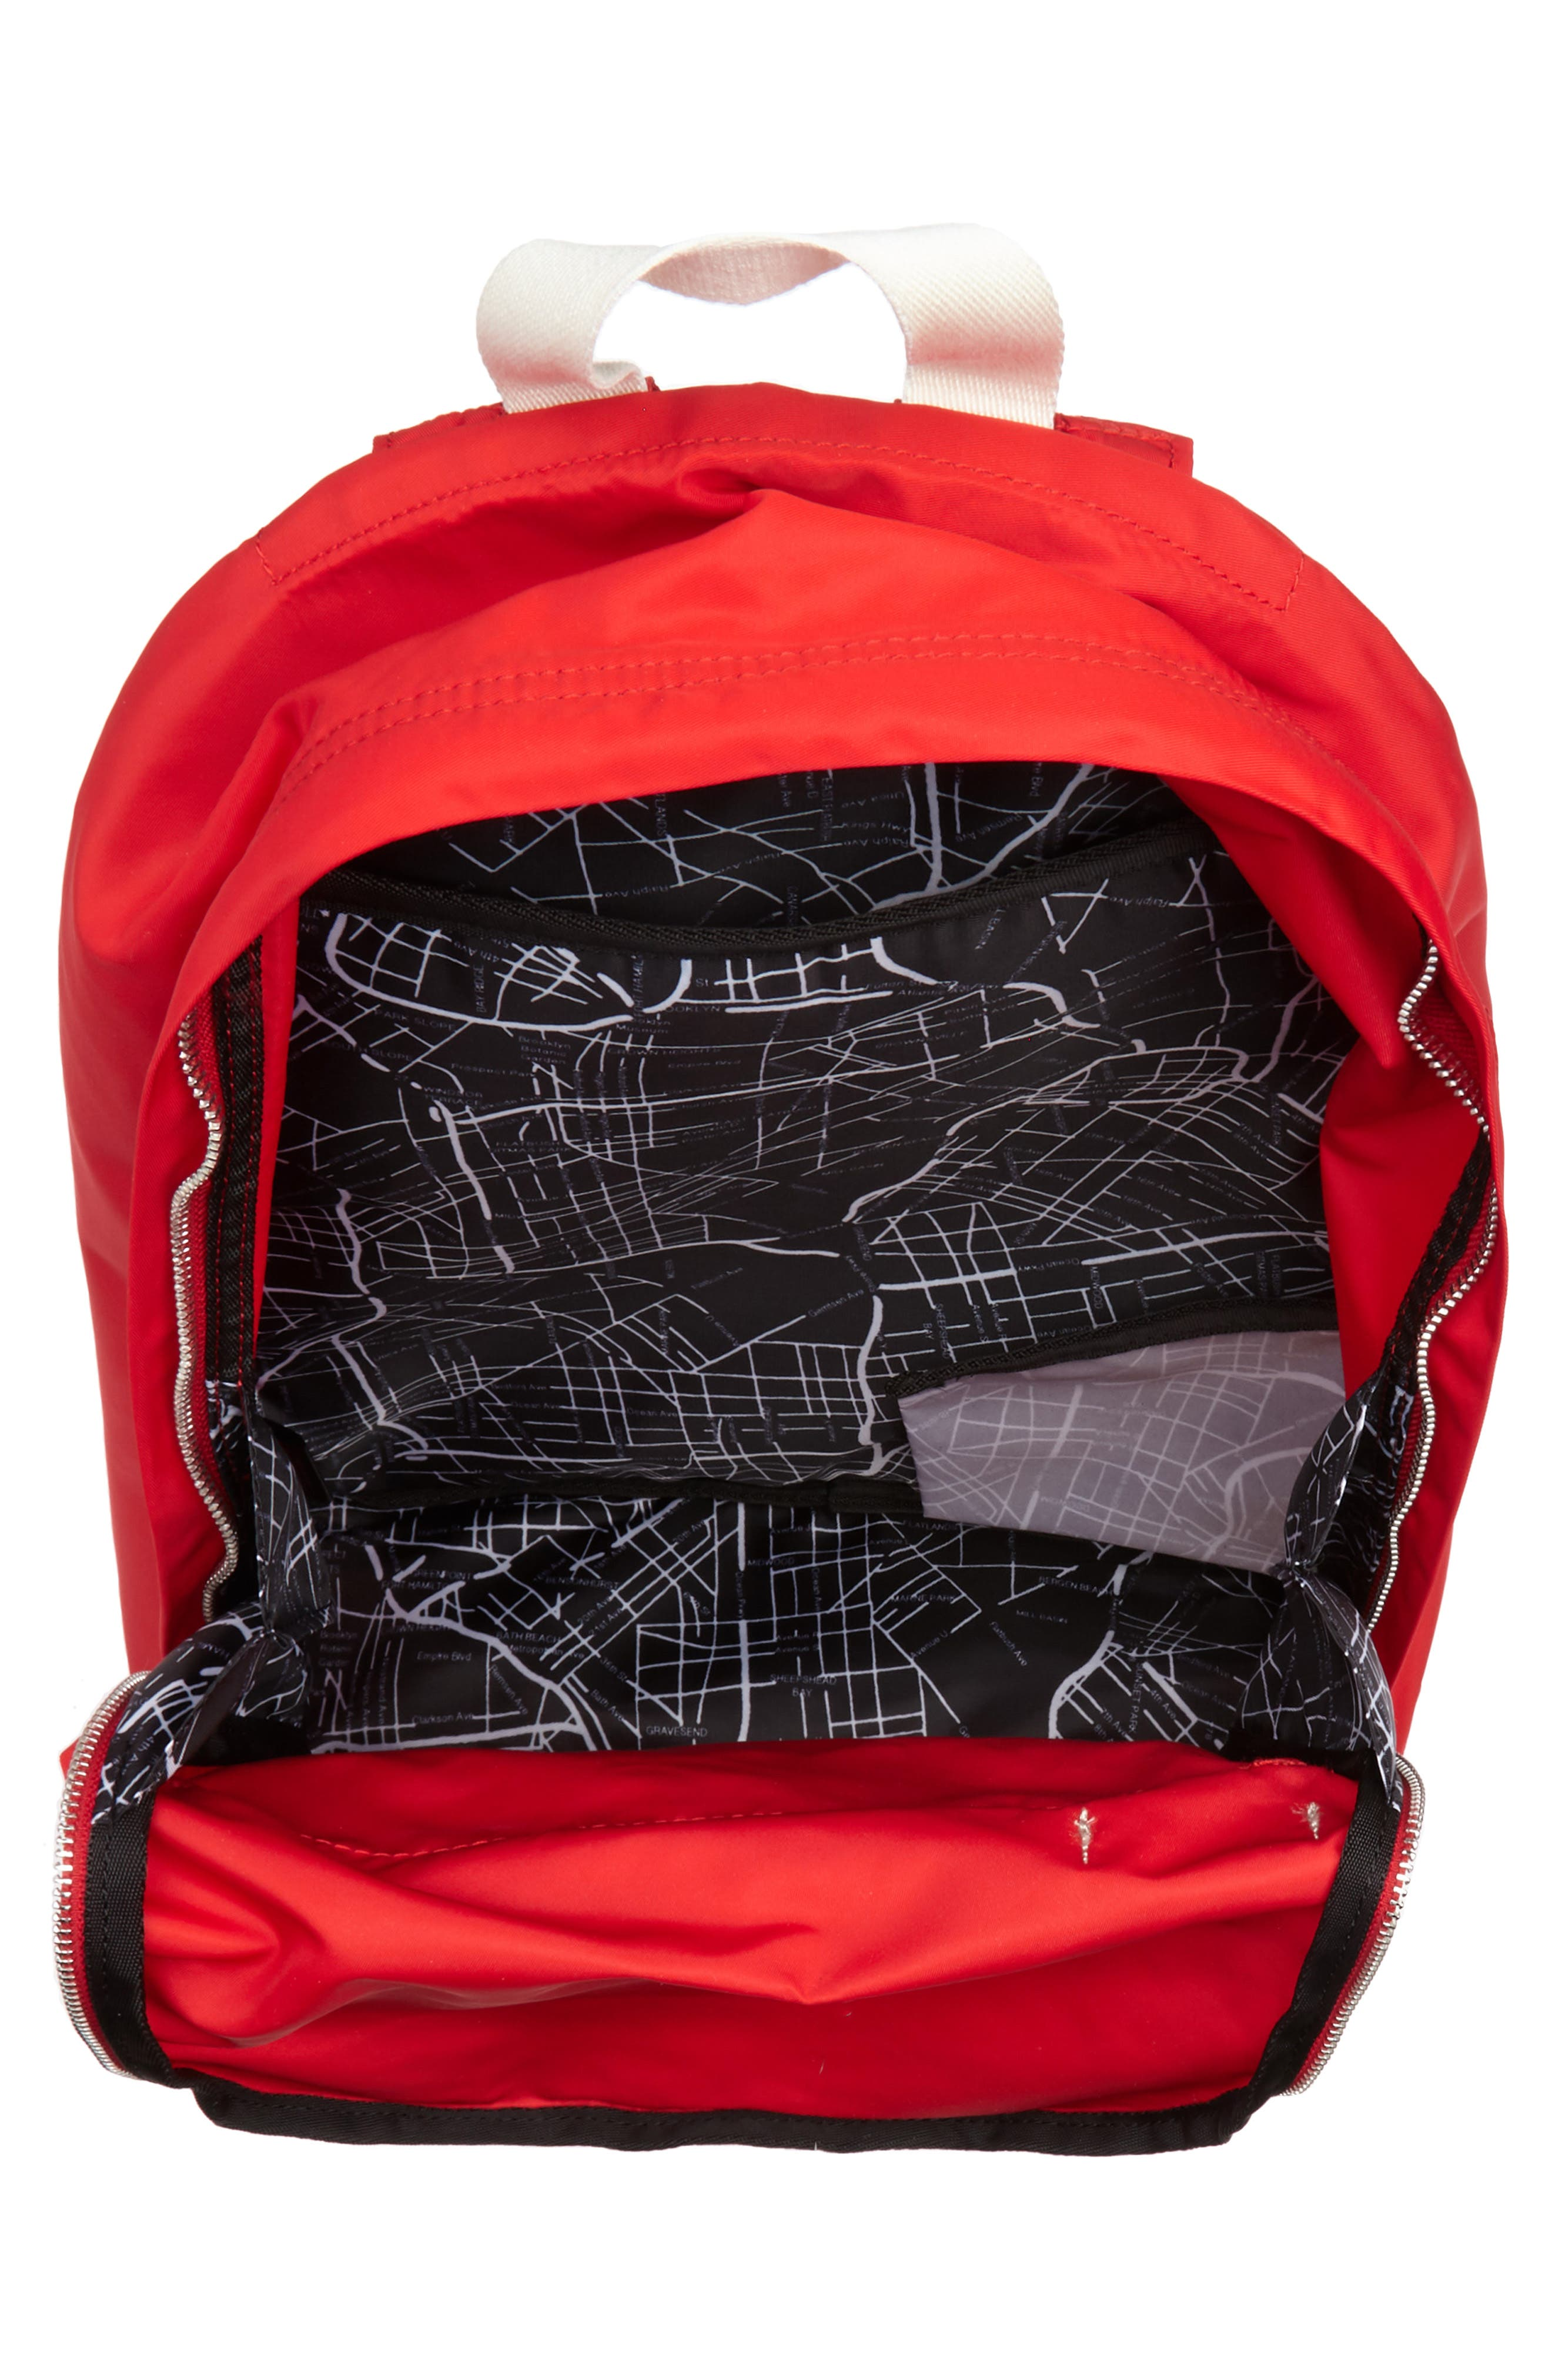 Heights Lorimer Nylon Backpack,                             Alternate thumbnail 4, color,                             Red